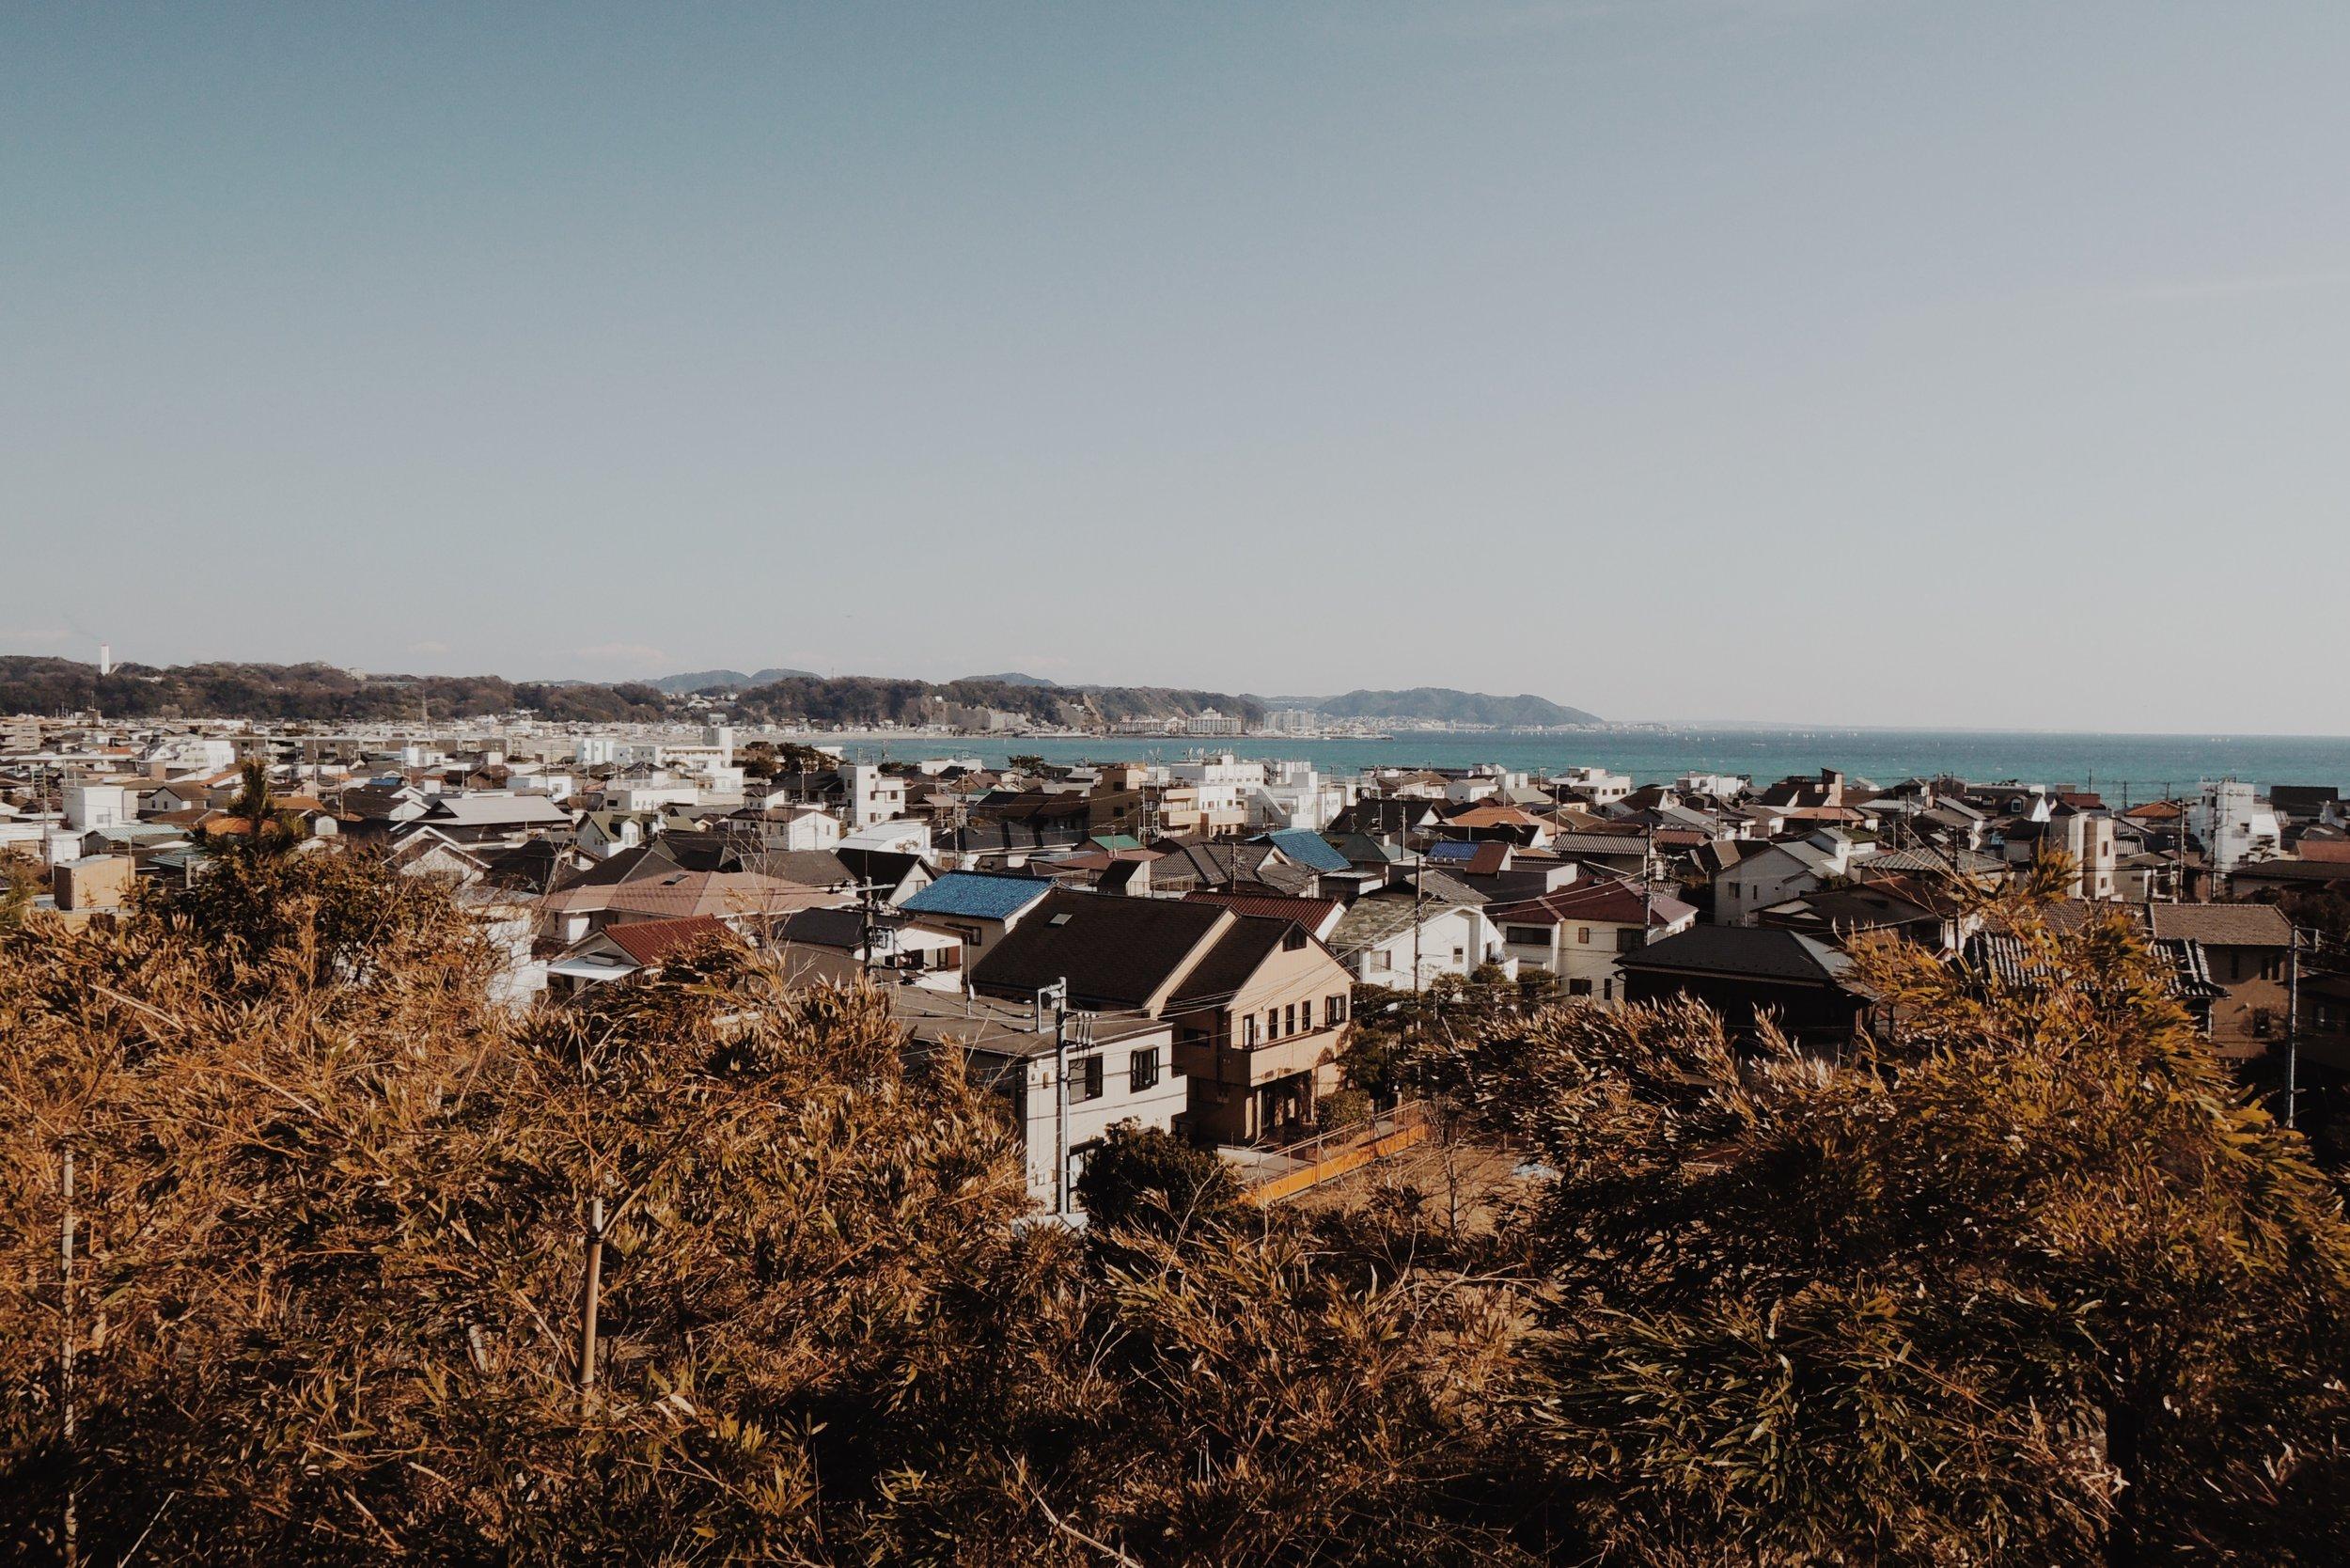 Postcard perfect views of the Sagami Bay